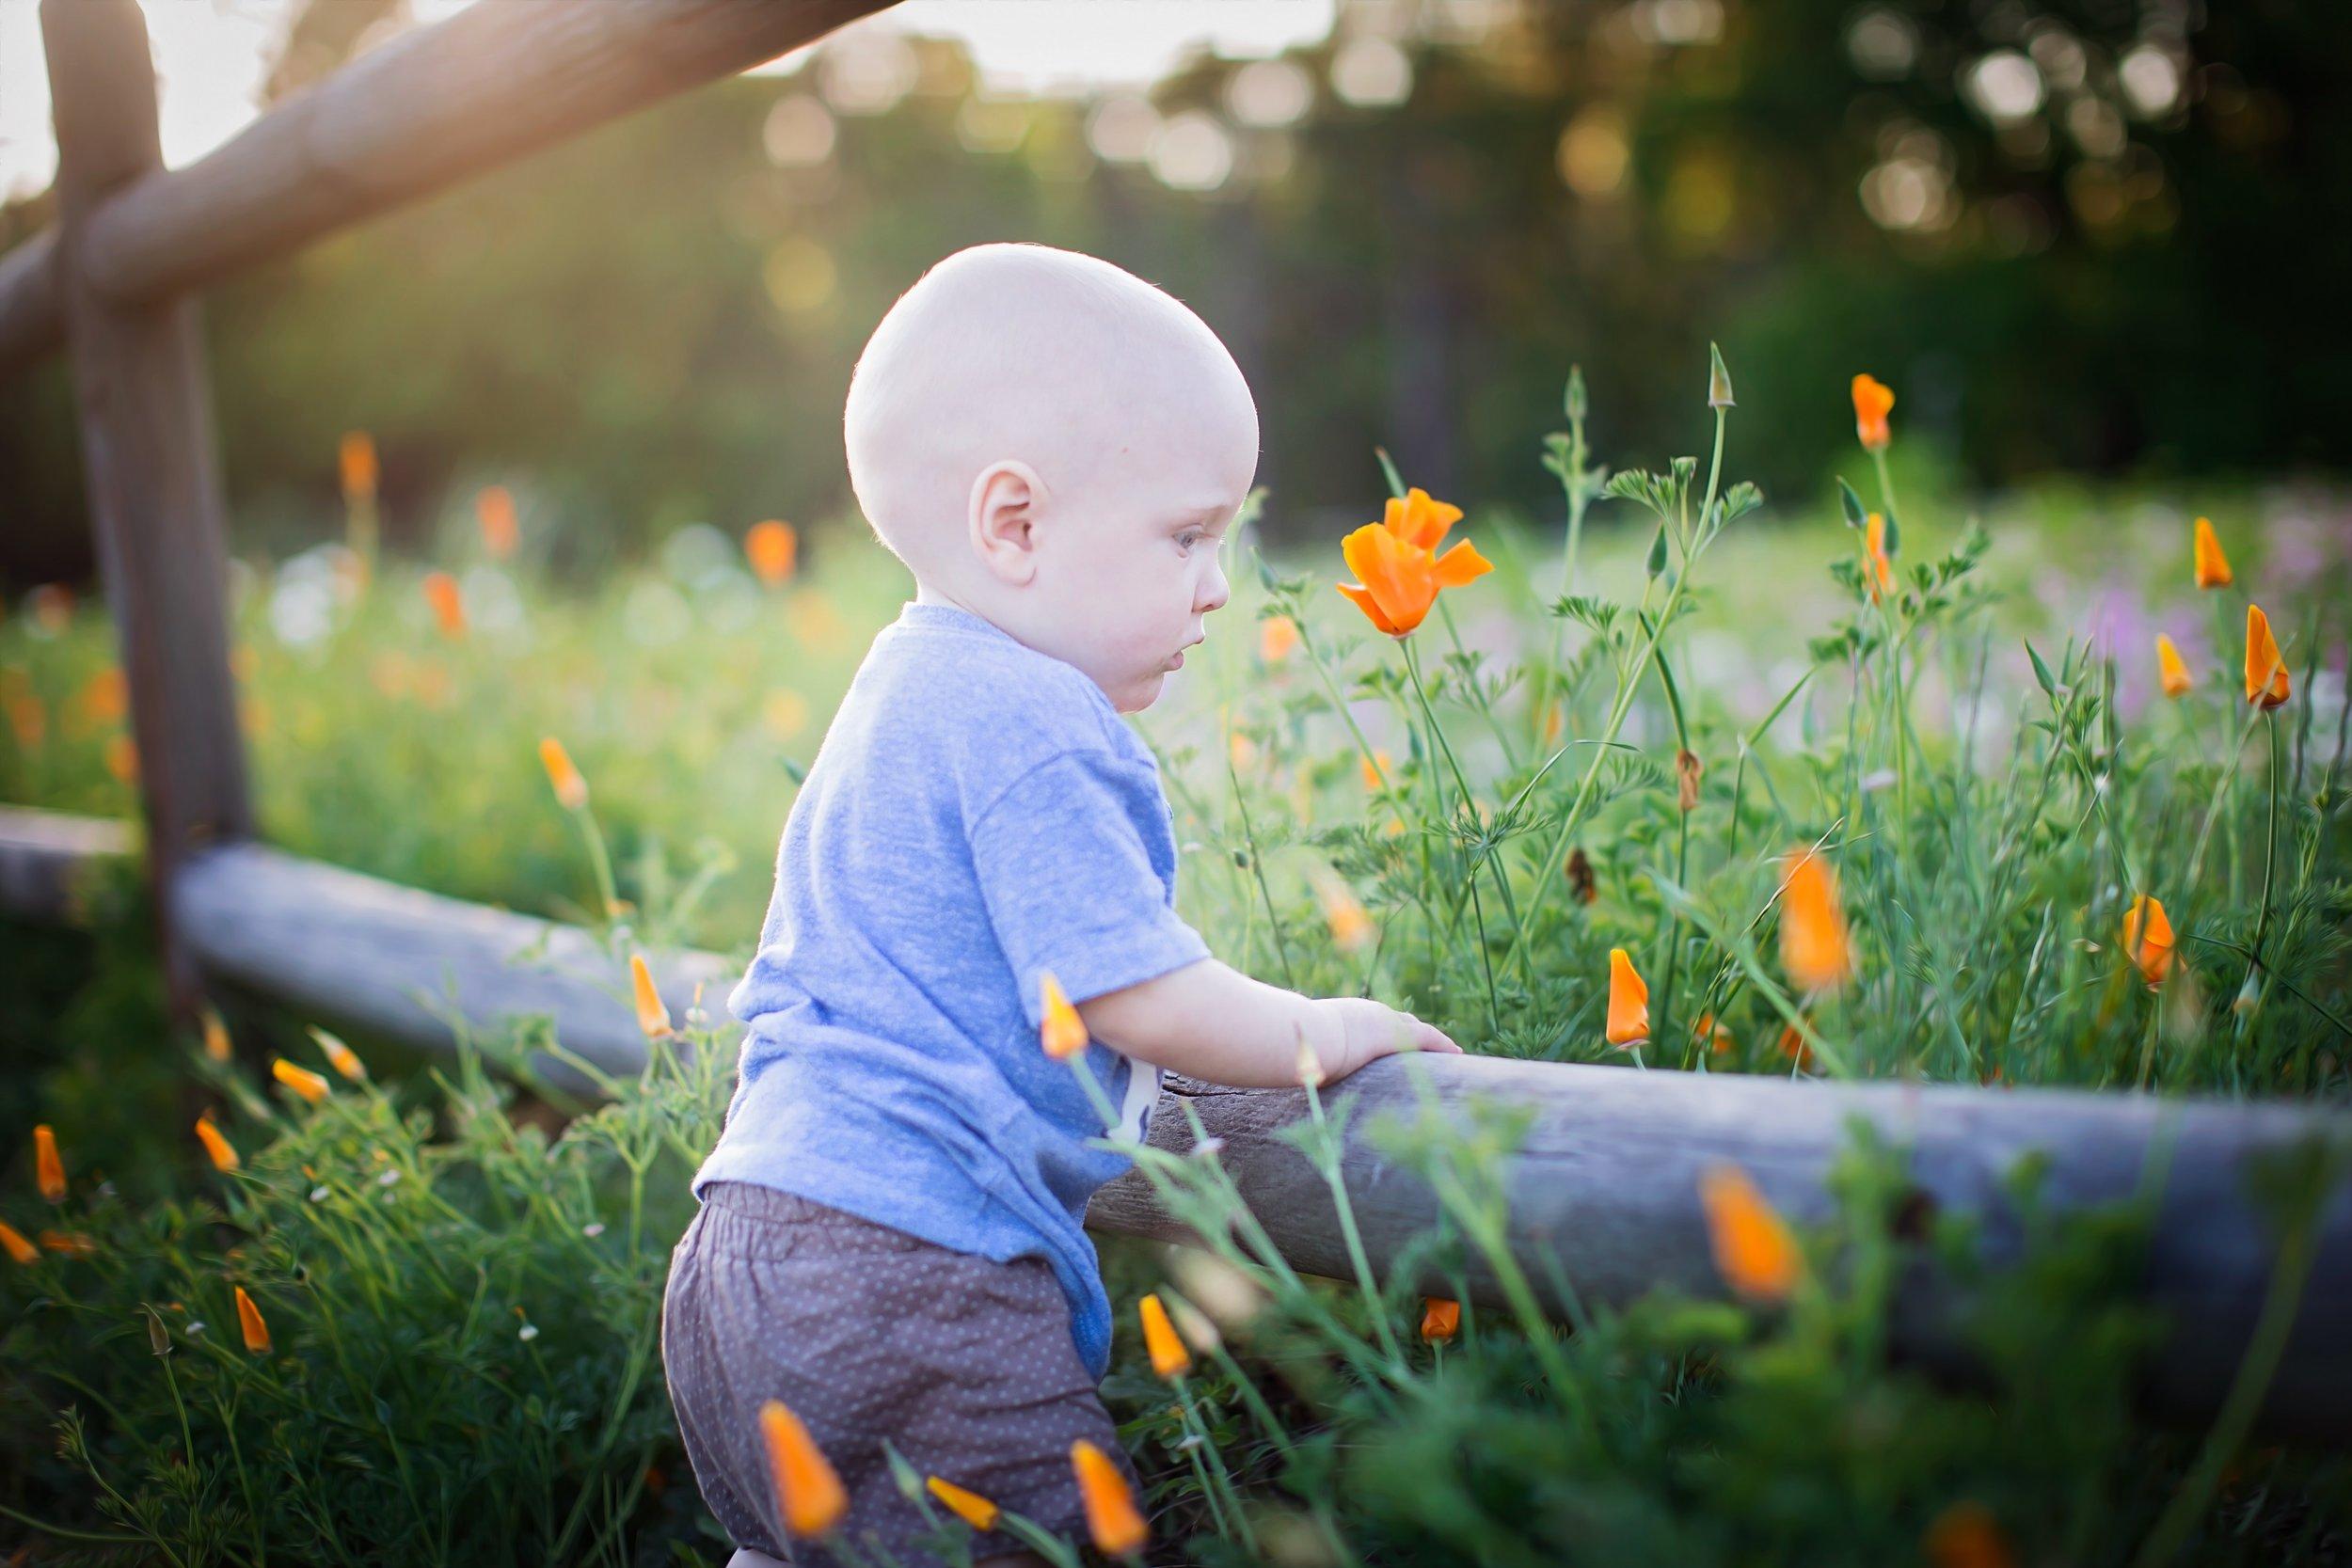 baby-flower-field-orange-poppy-390616.jpg